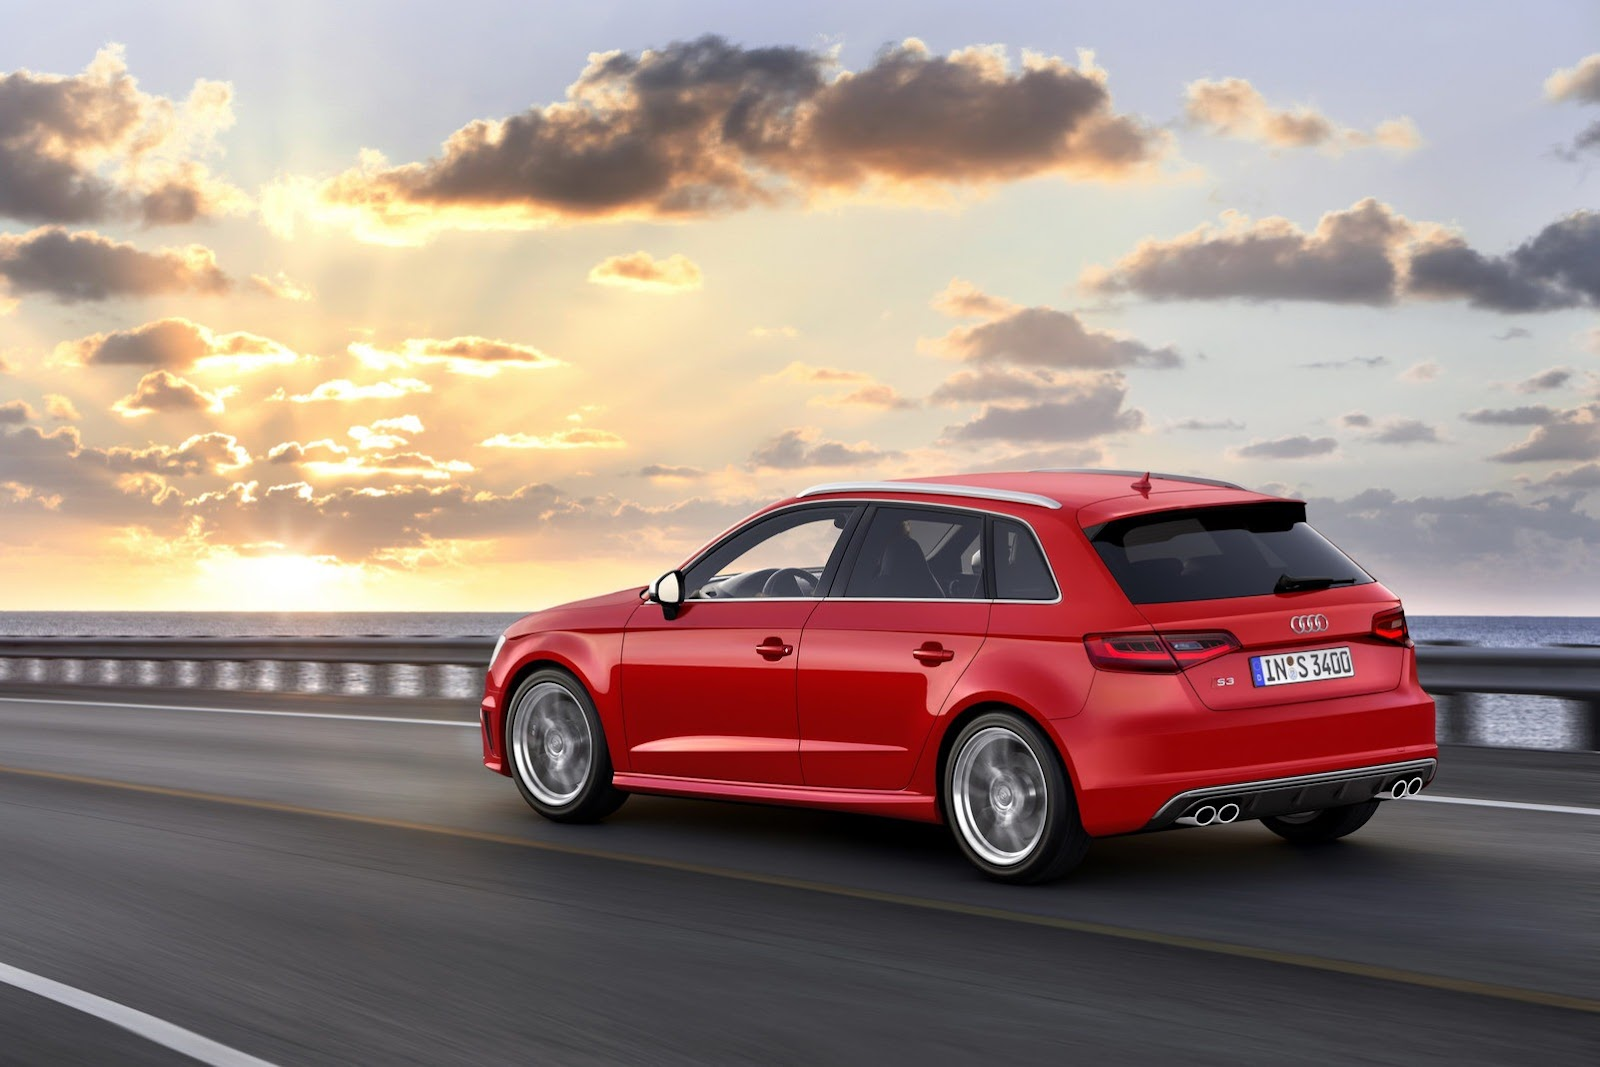 Audi-S3-Sportback-3%5B2%5D.jpg